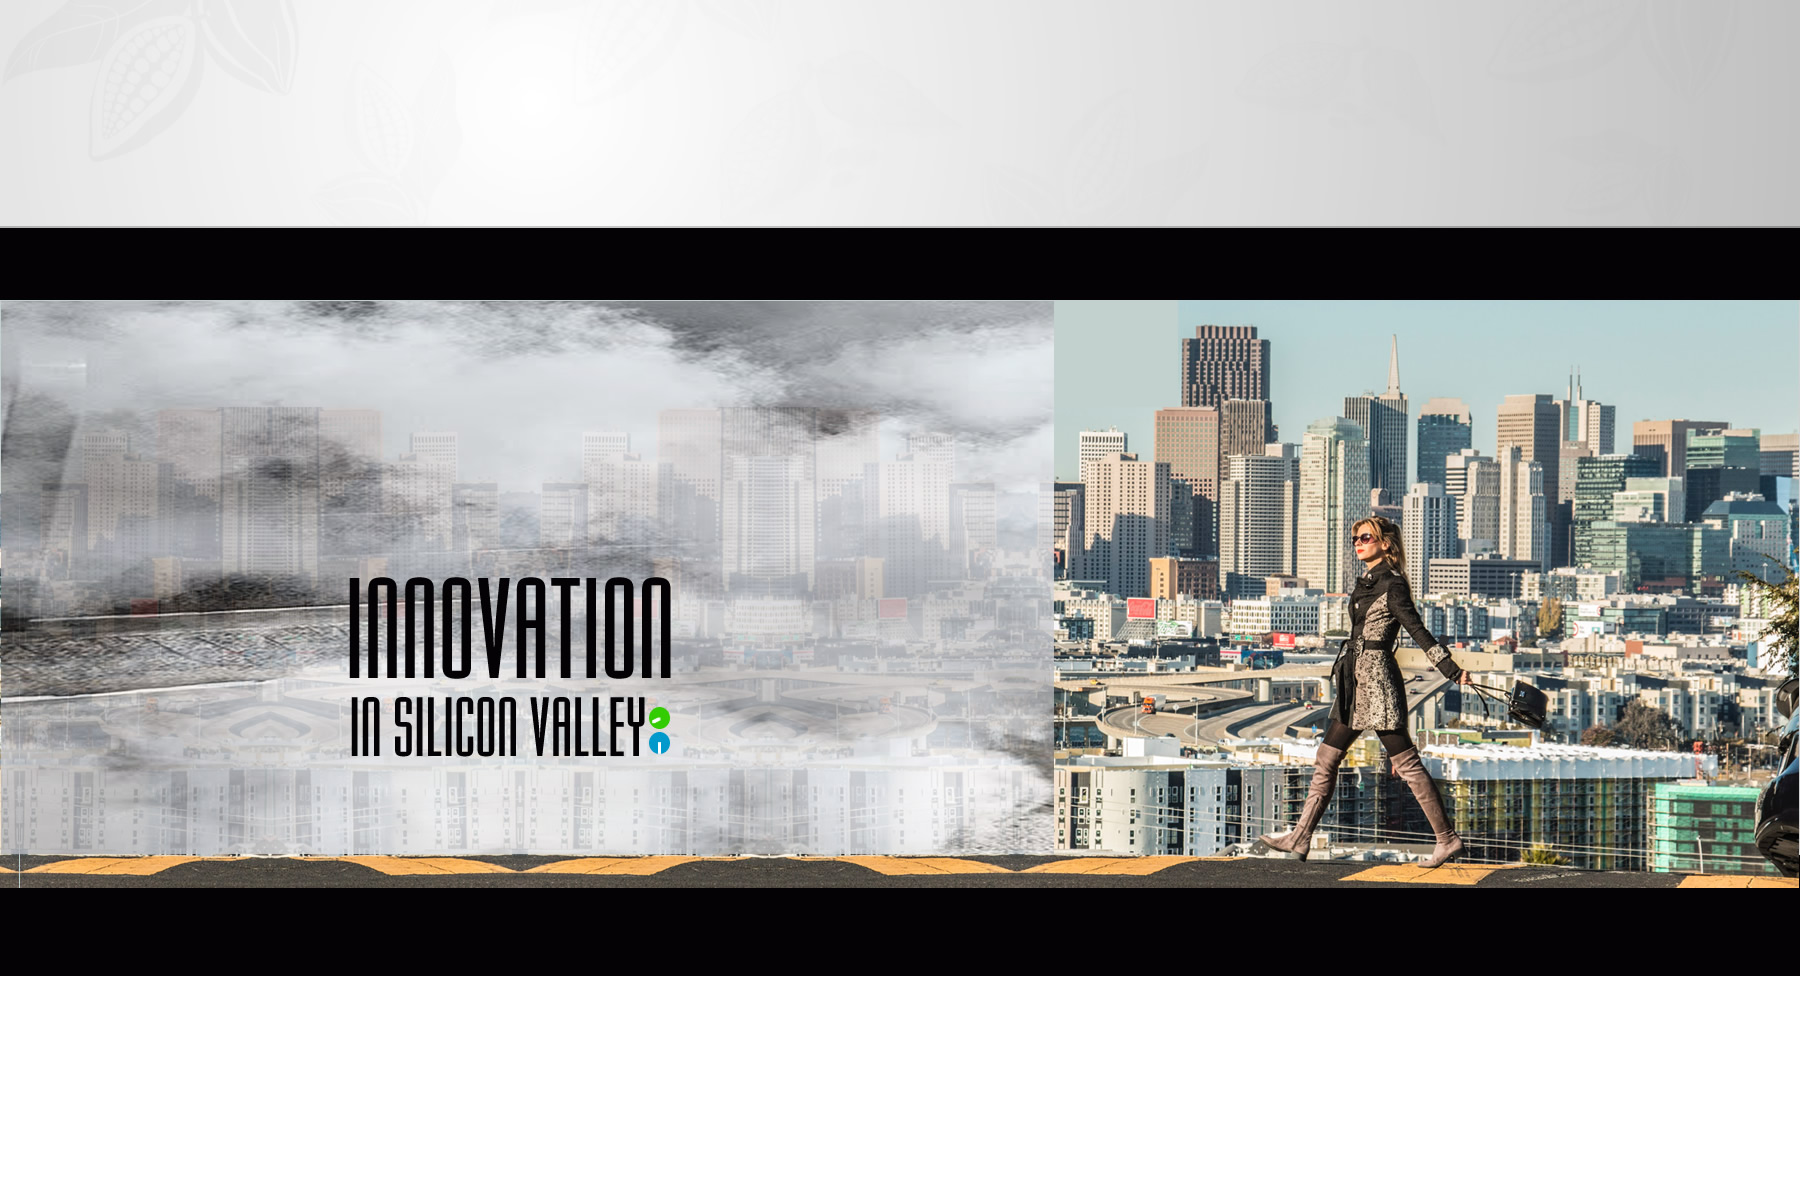 8:30 VEG Innovation